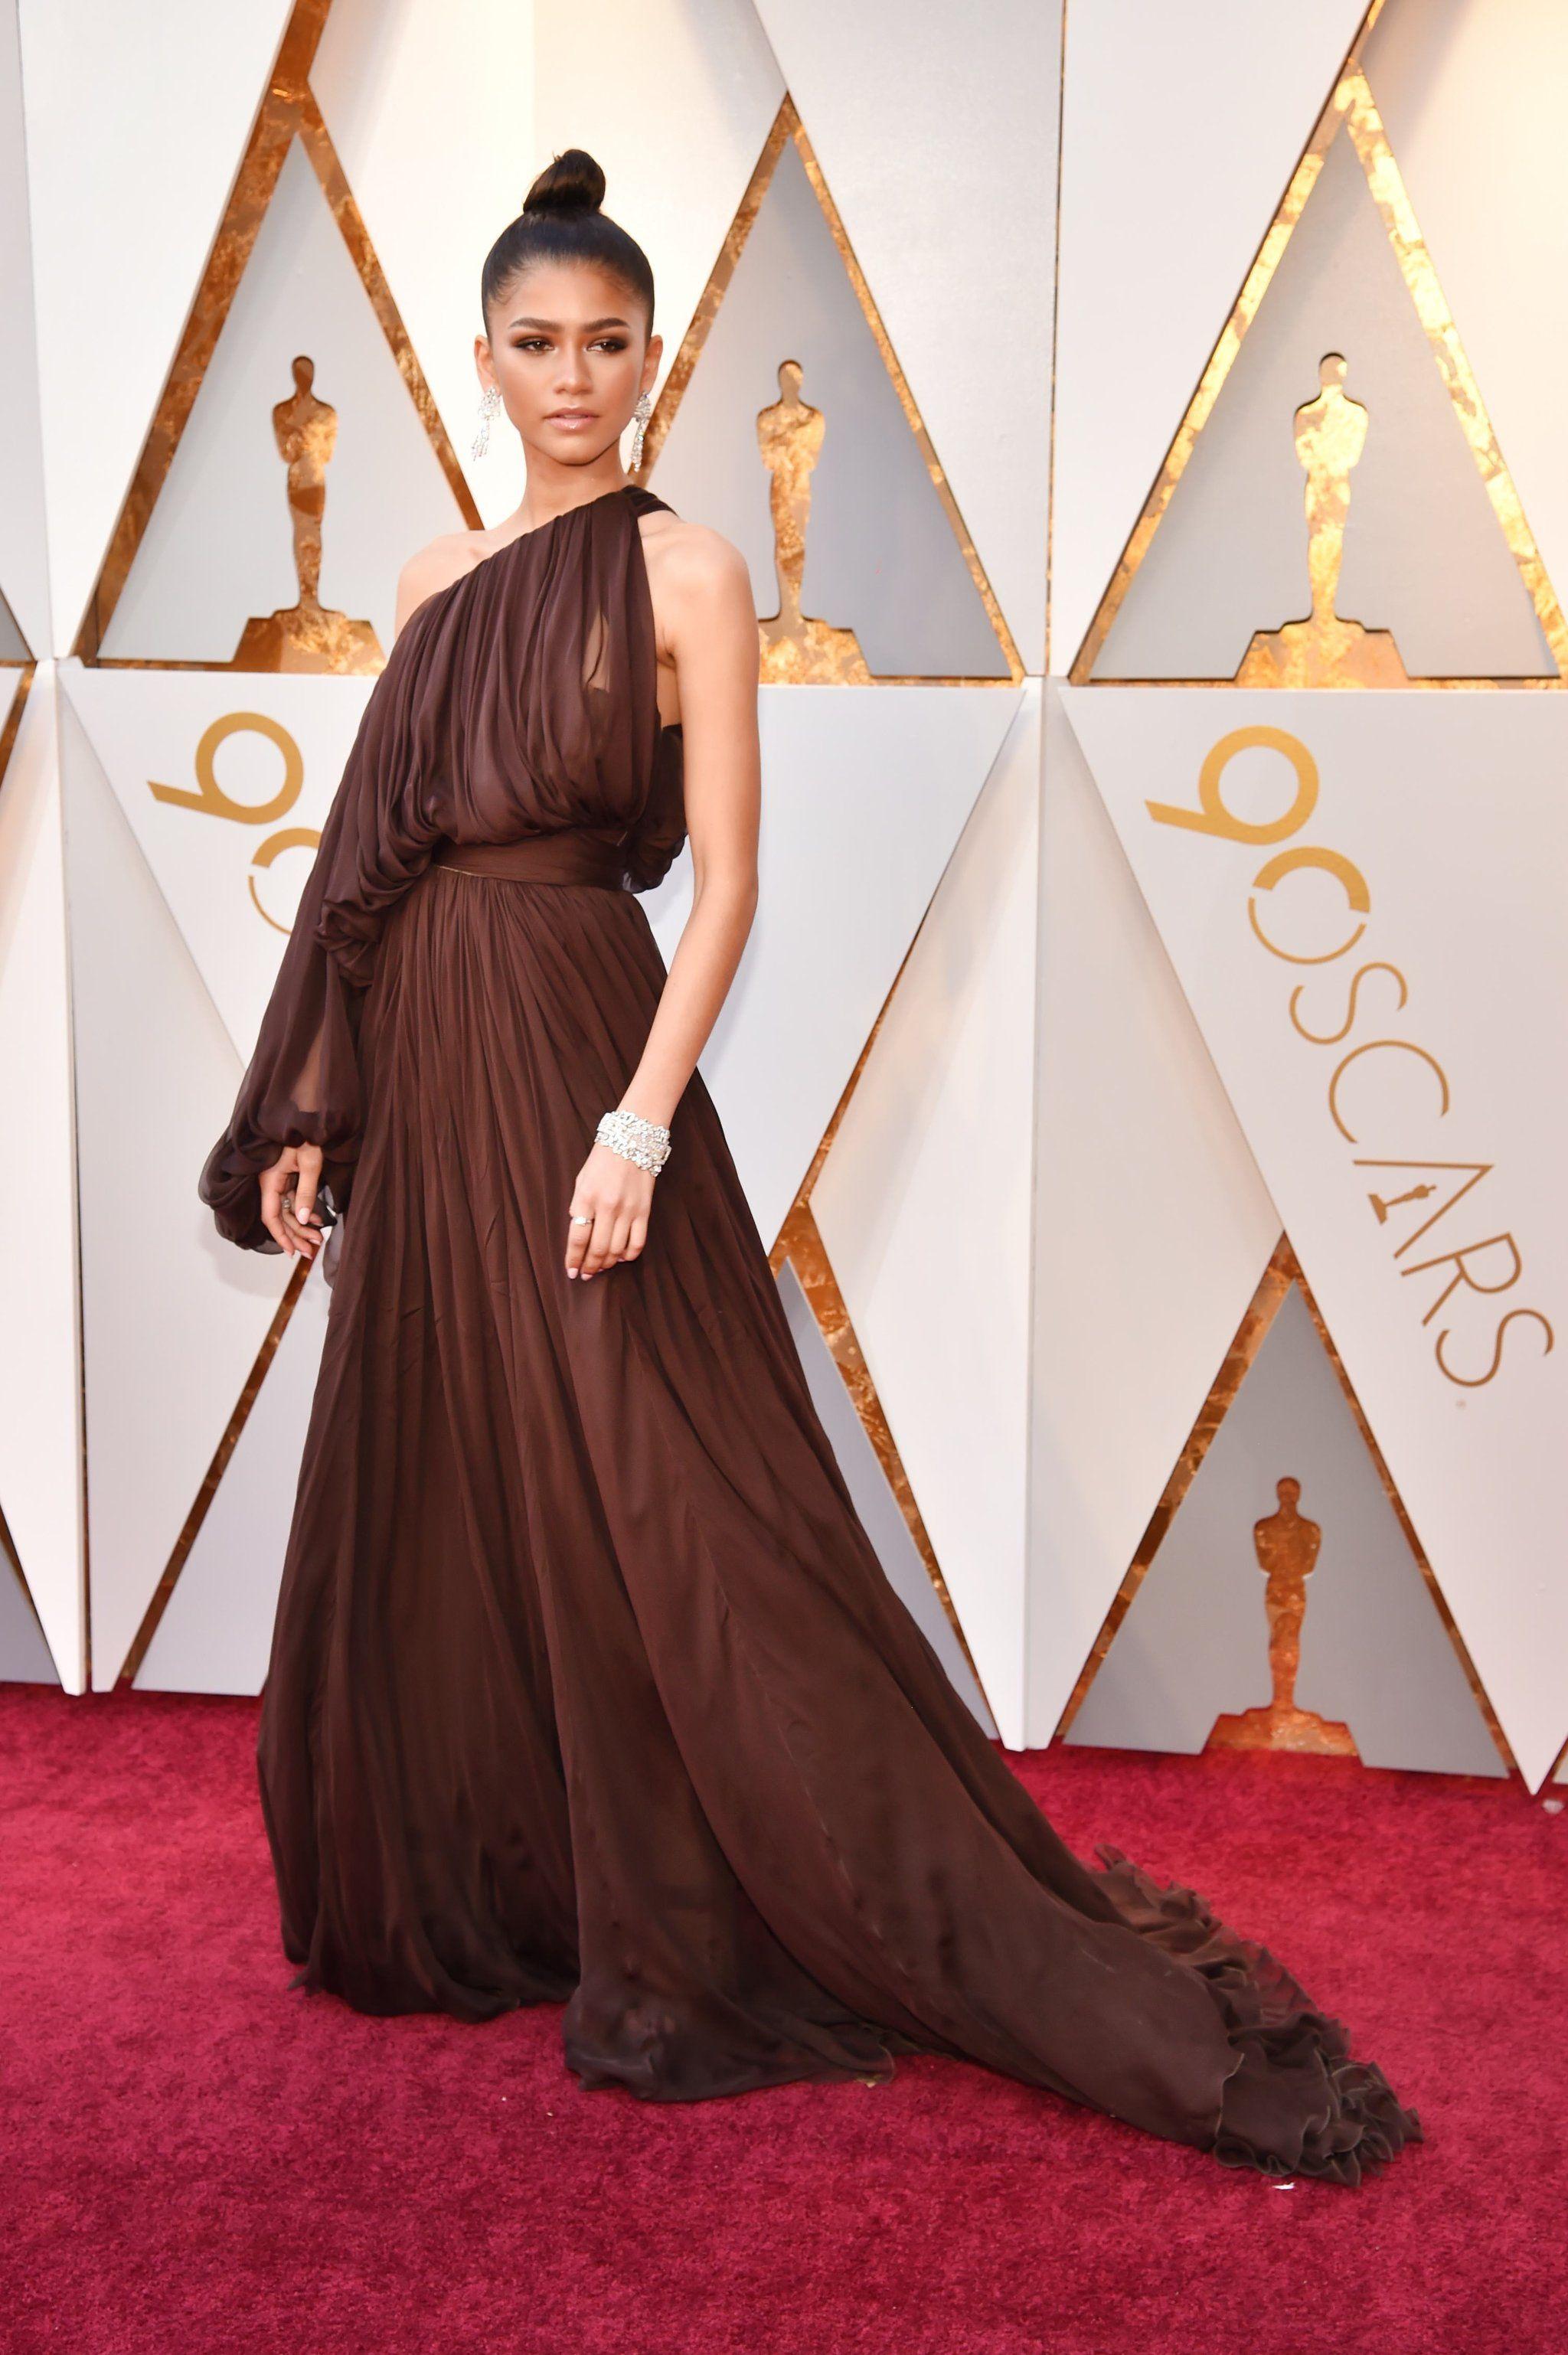 Zendayaus dress looks like itus falling off her shoulder but donut